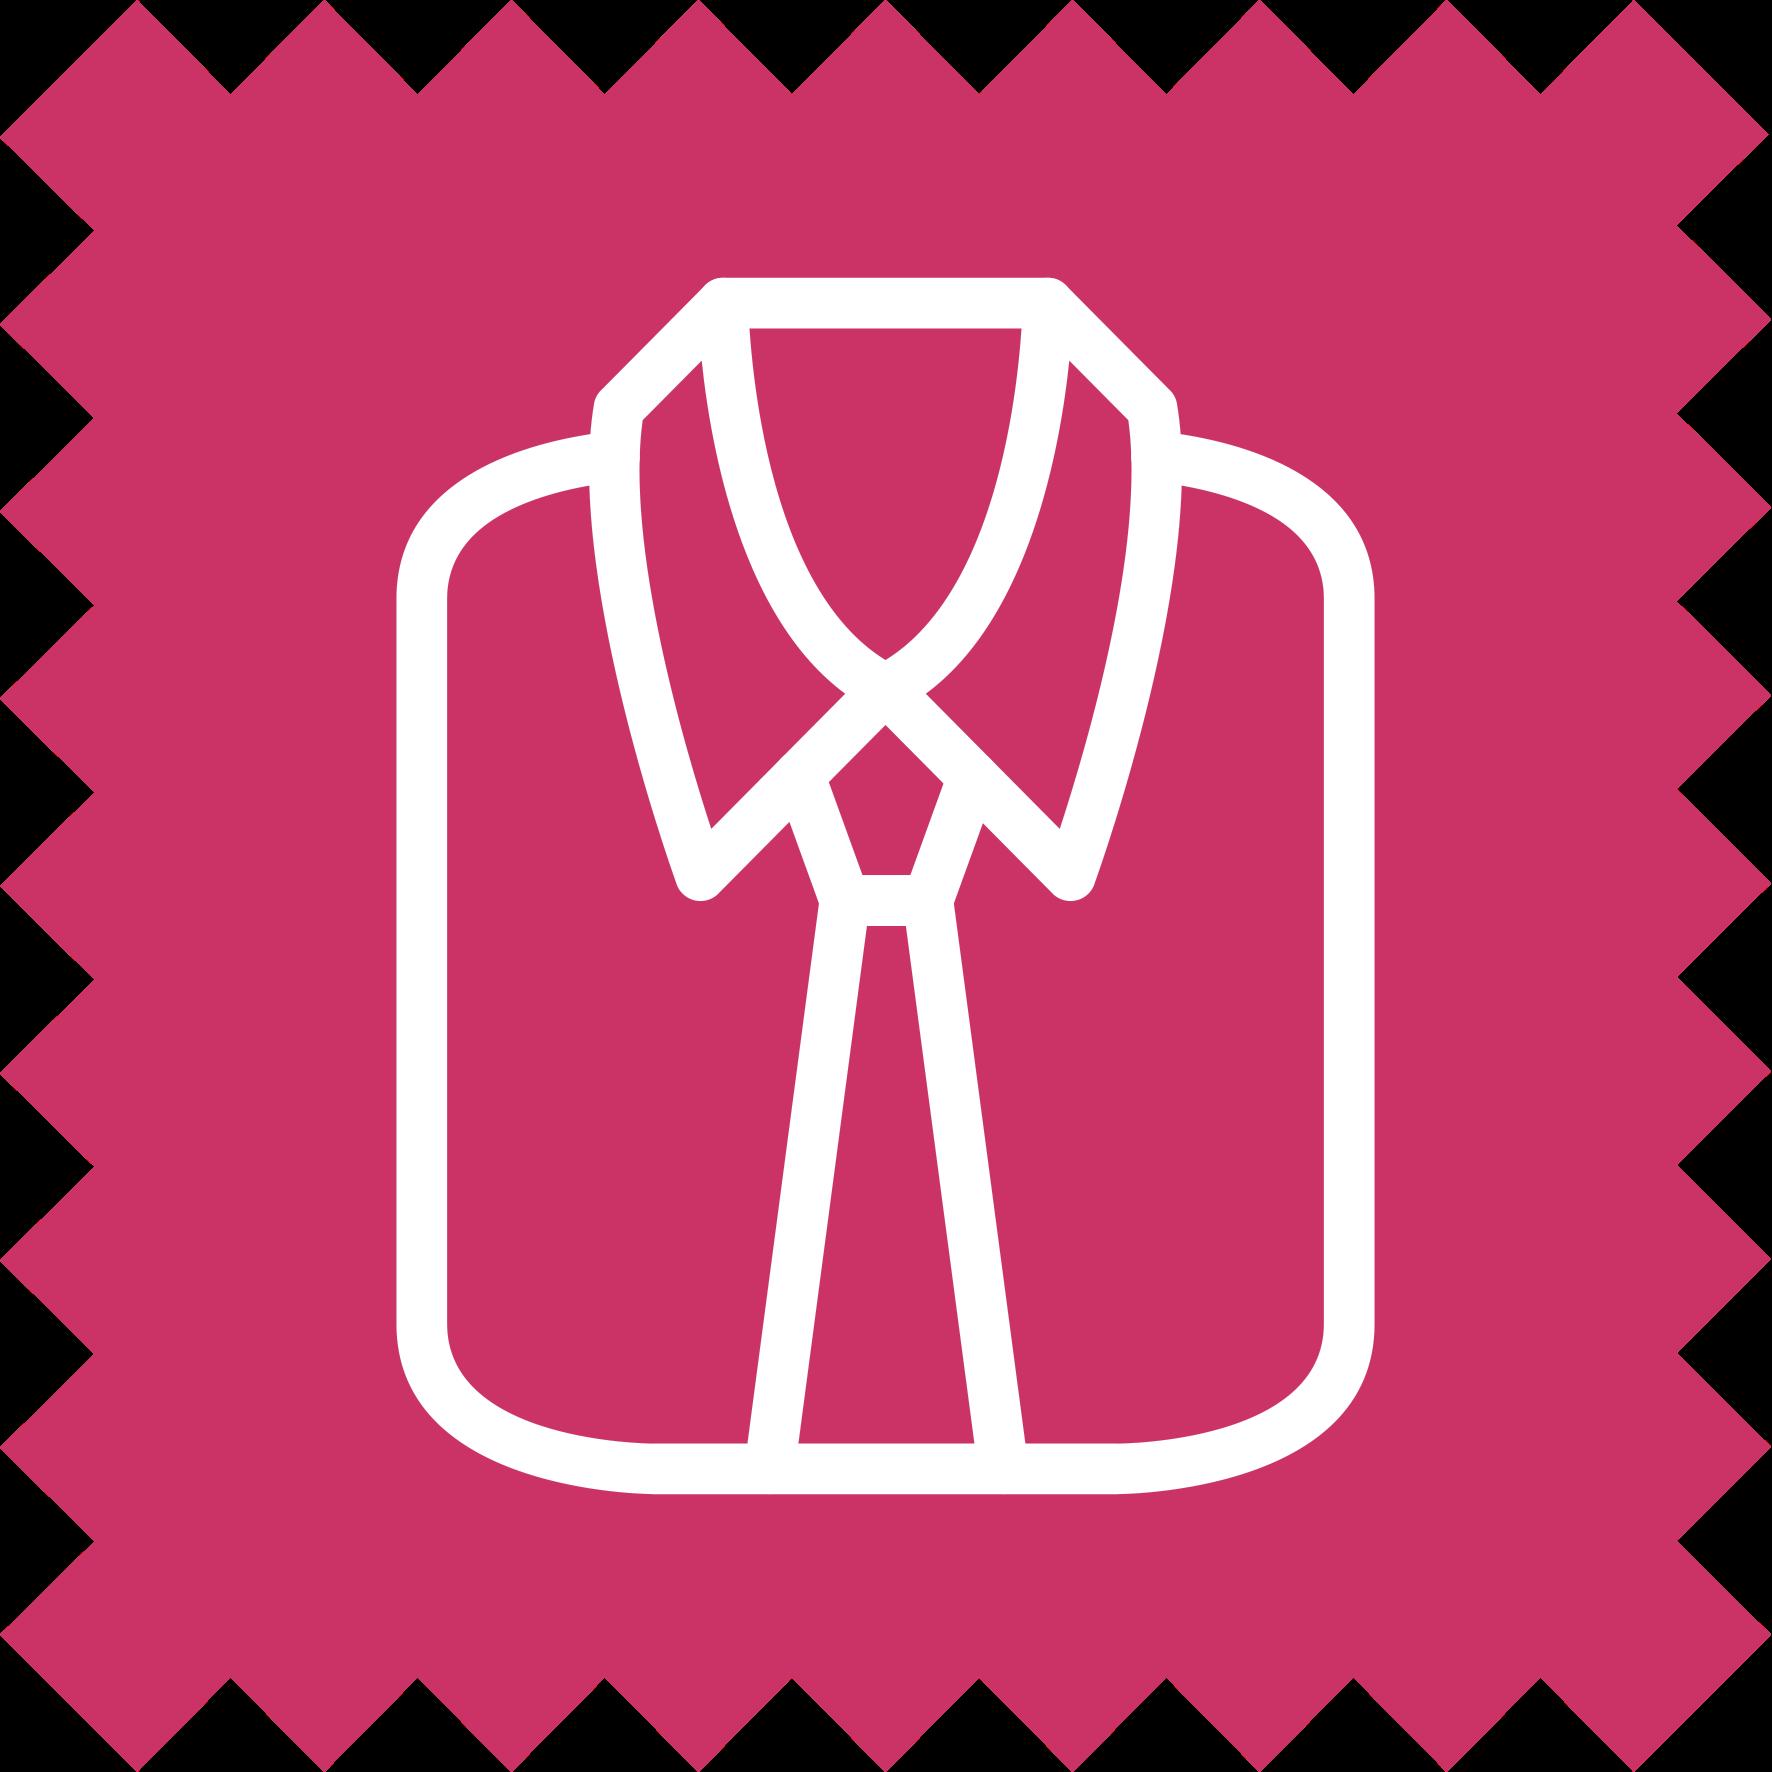 Shirt Services Acton W3 London